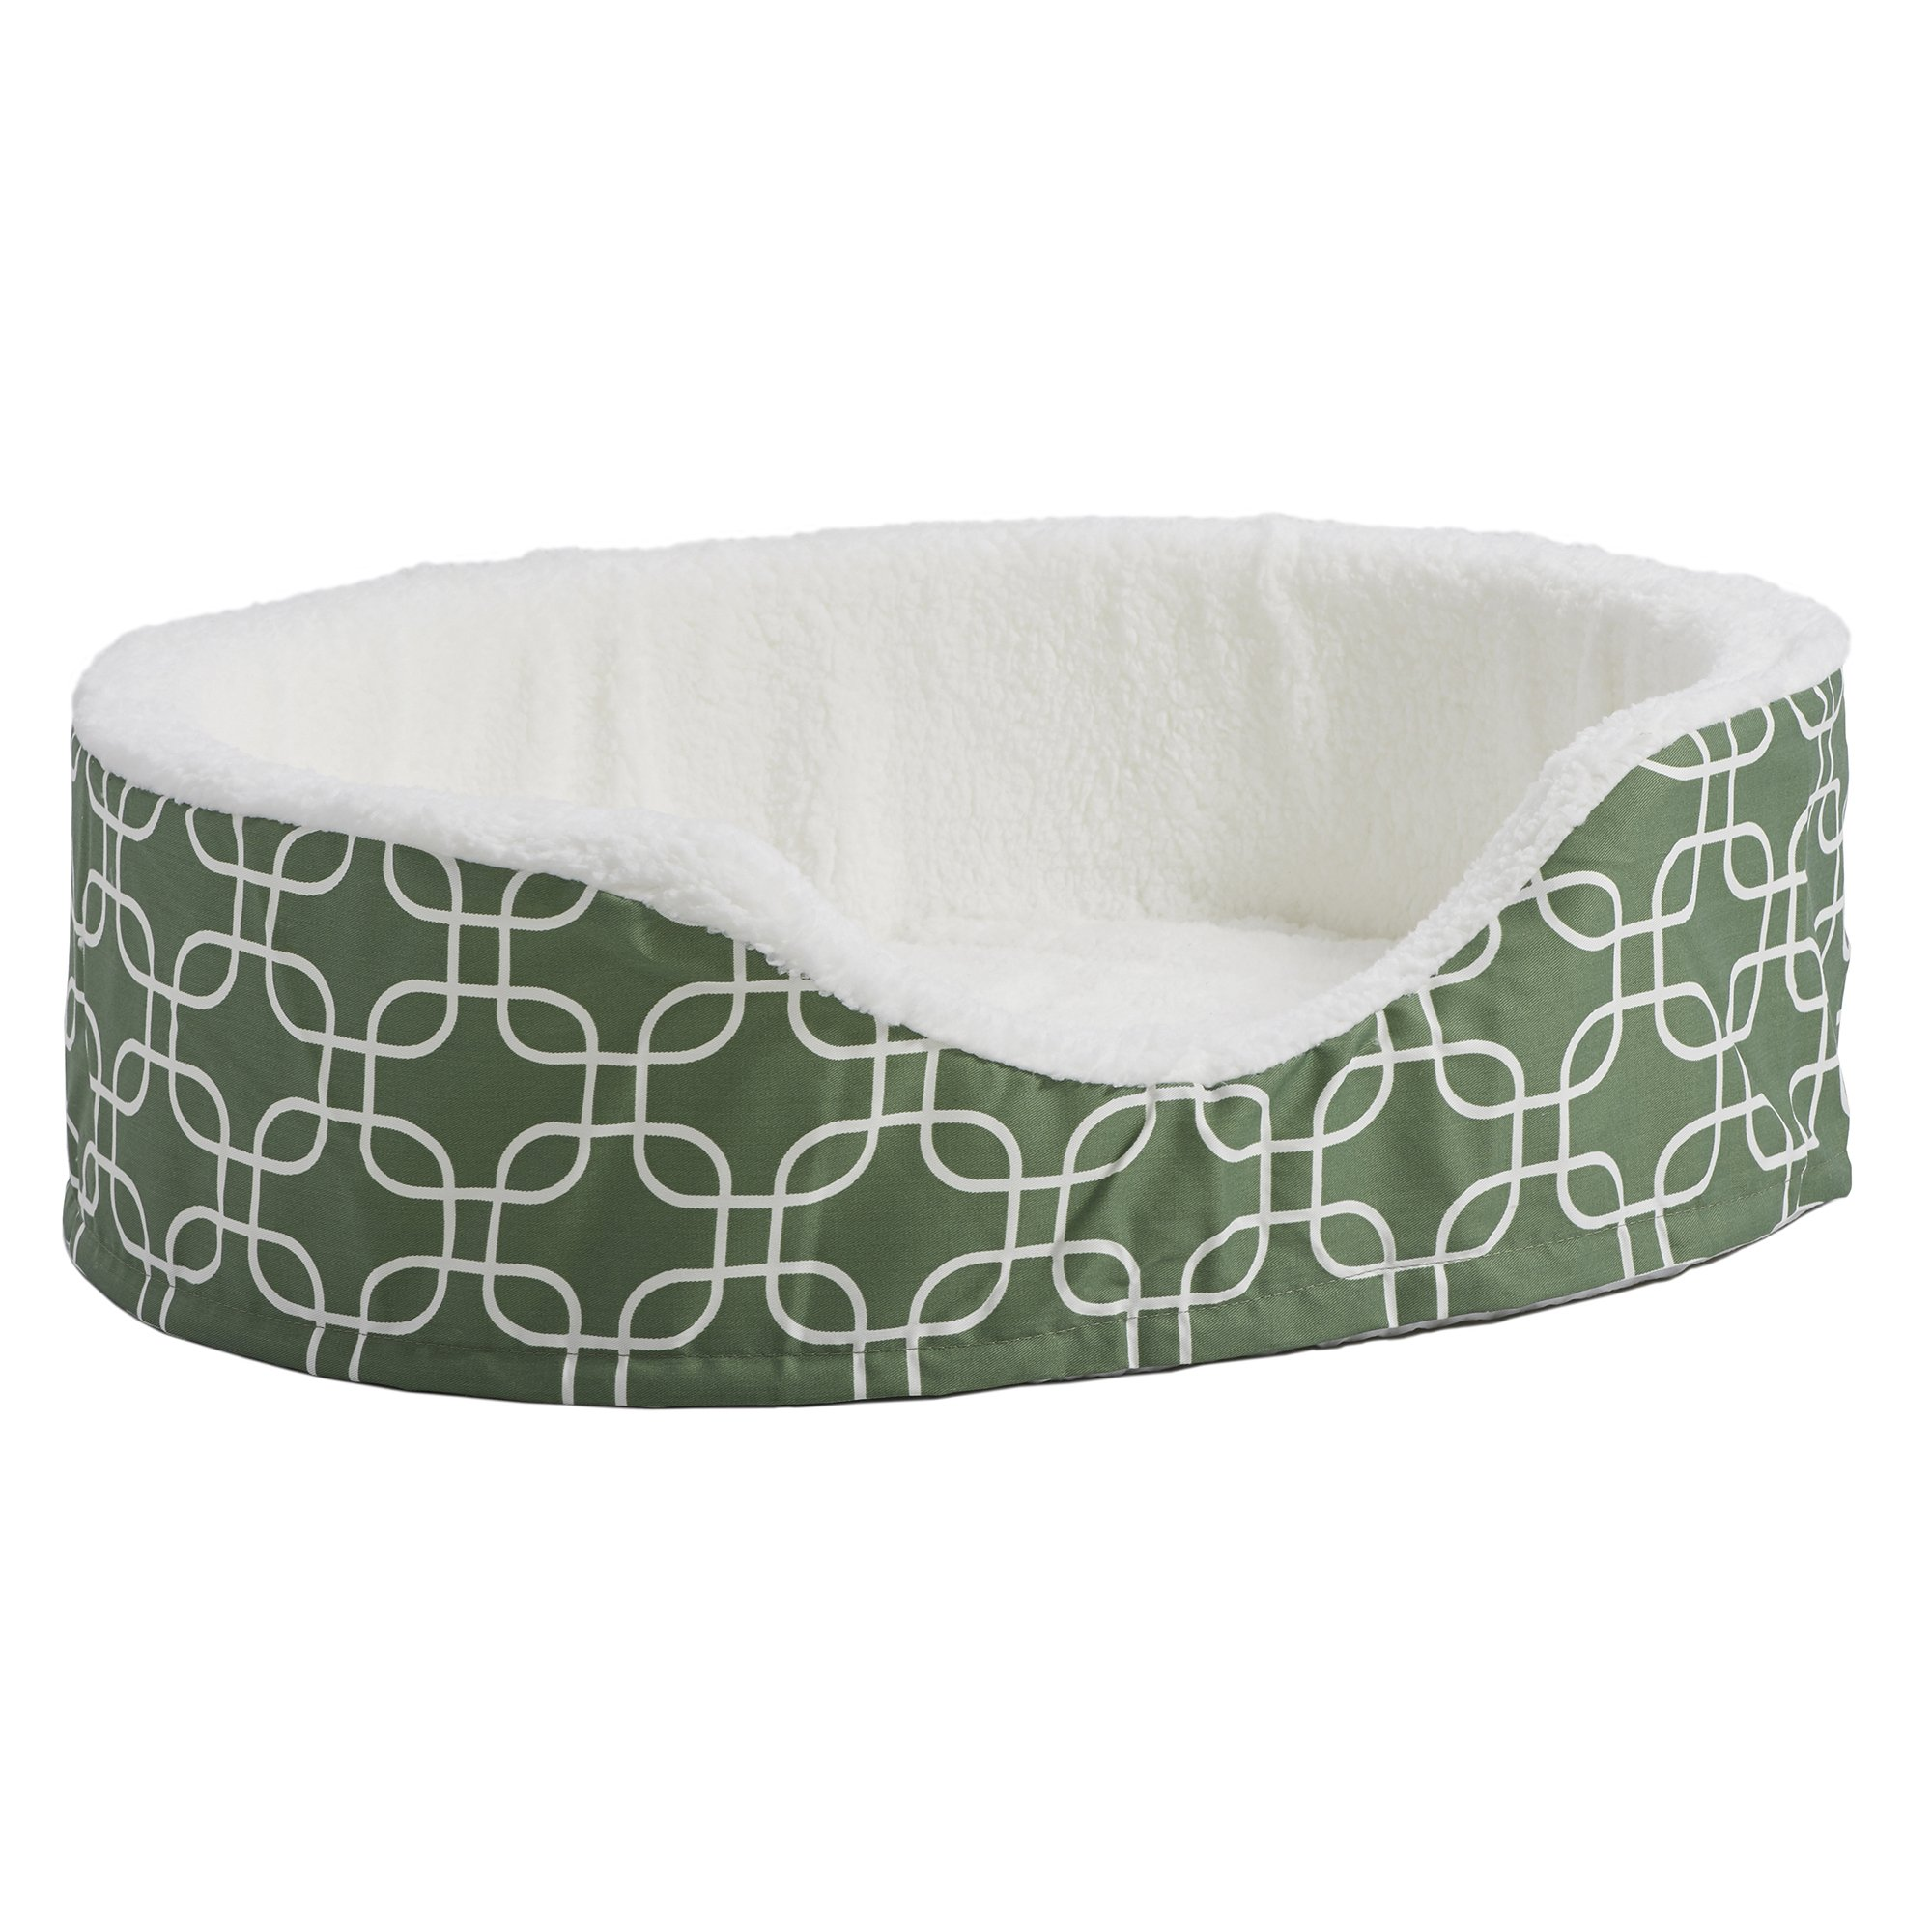 Orthoperdic Egg-Crate Nesting Pet Bed w/ Teflon Fabric Protector, Medium Green